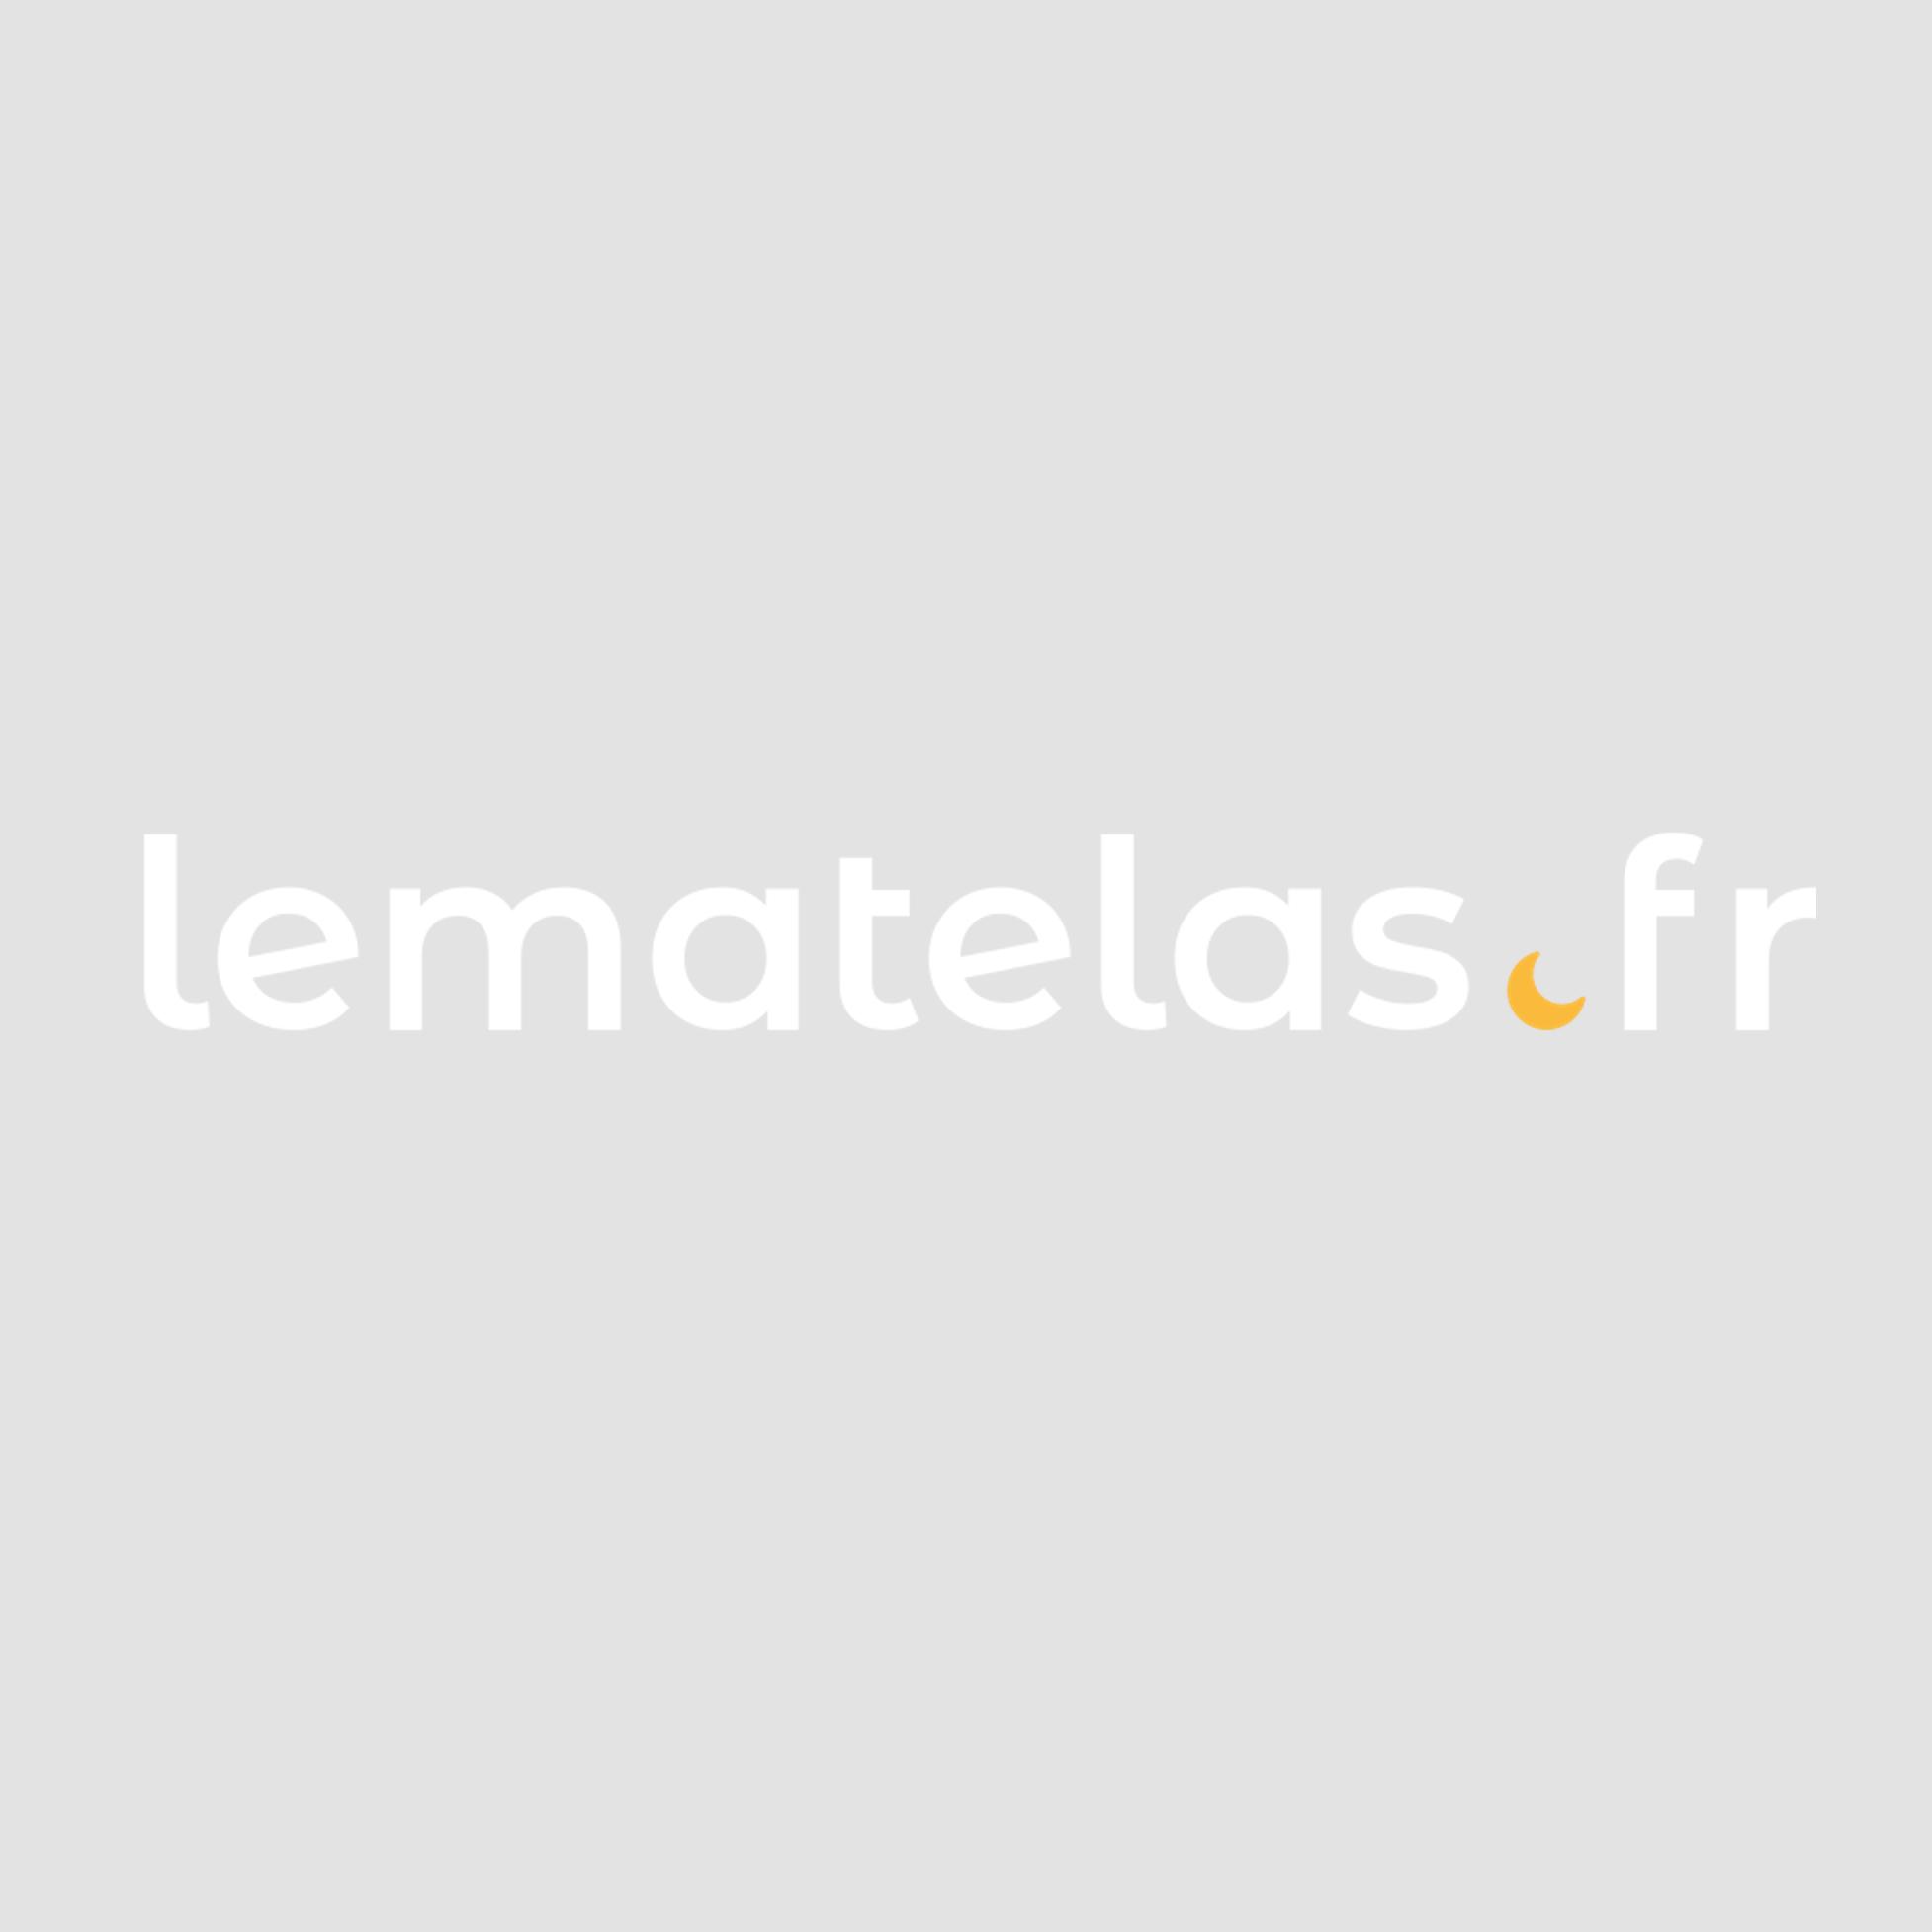 protection matelas jetable amazing al se jetable pas cher avec literie jetable pas cher avec. Black Bedroom Furniture Sets. Home Design Ideas